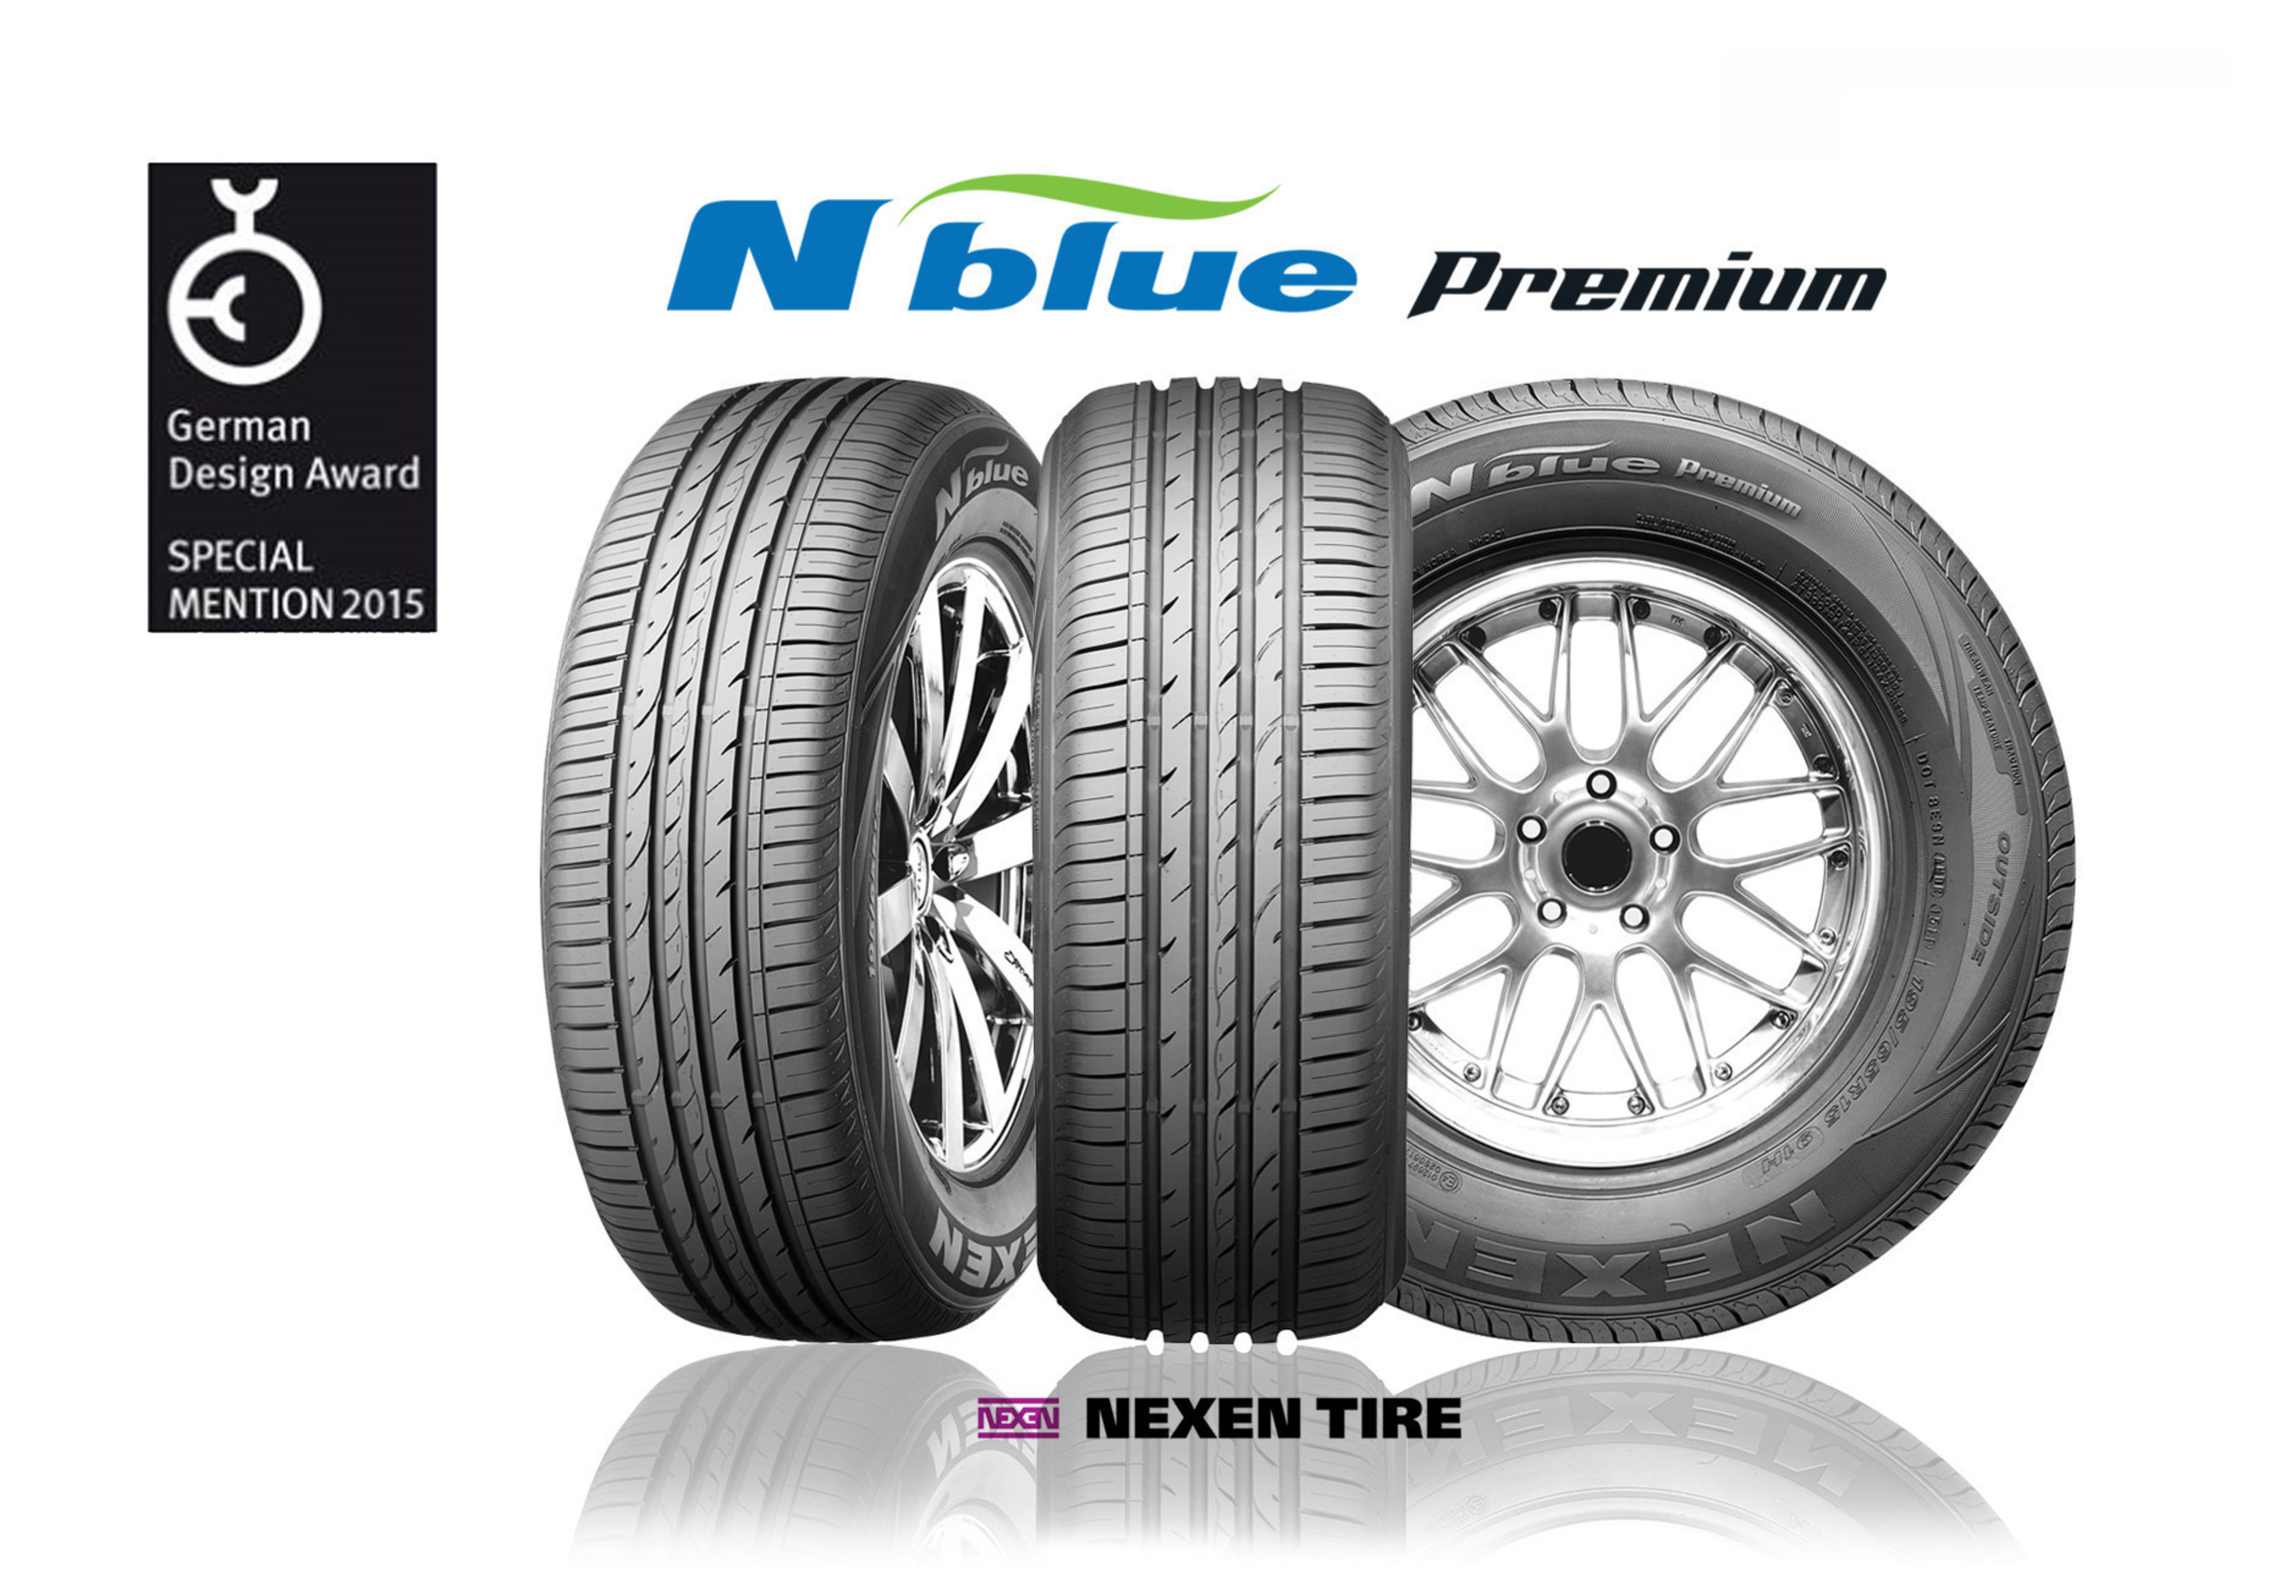 Nexen Tire suministra neumáticos como equipamiento original para Renault y el Smart de Daimler